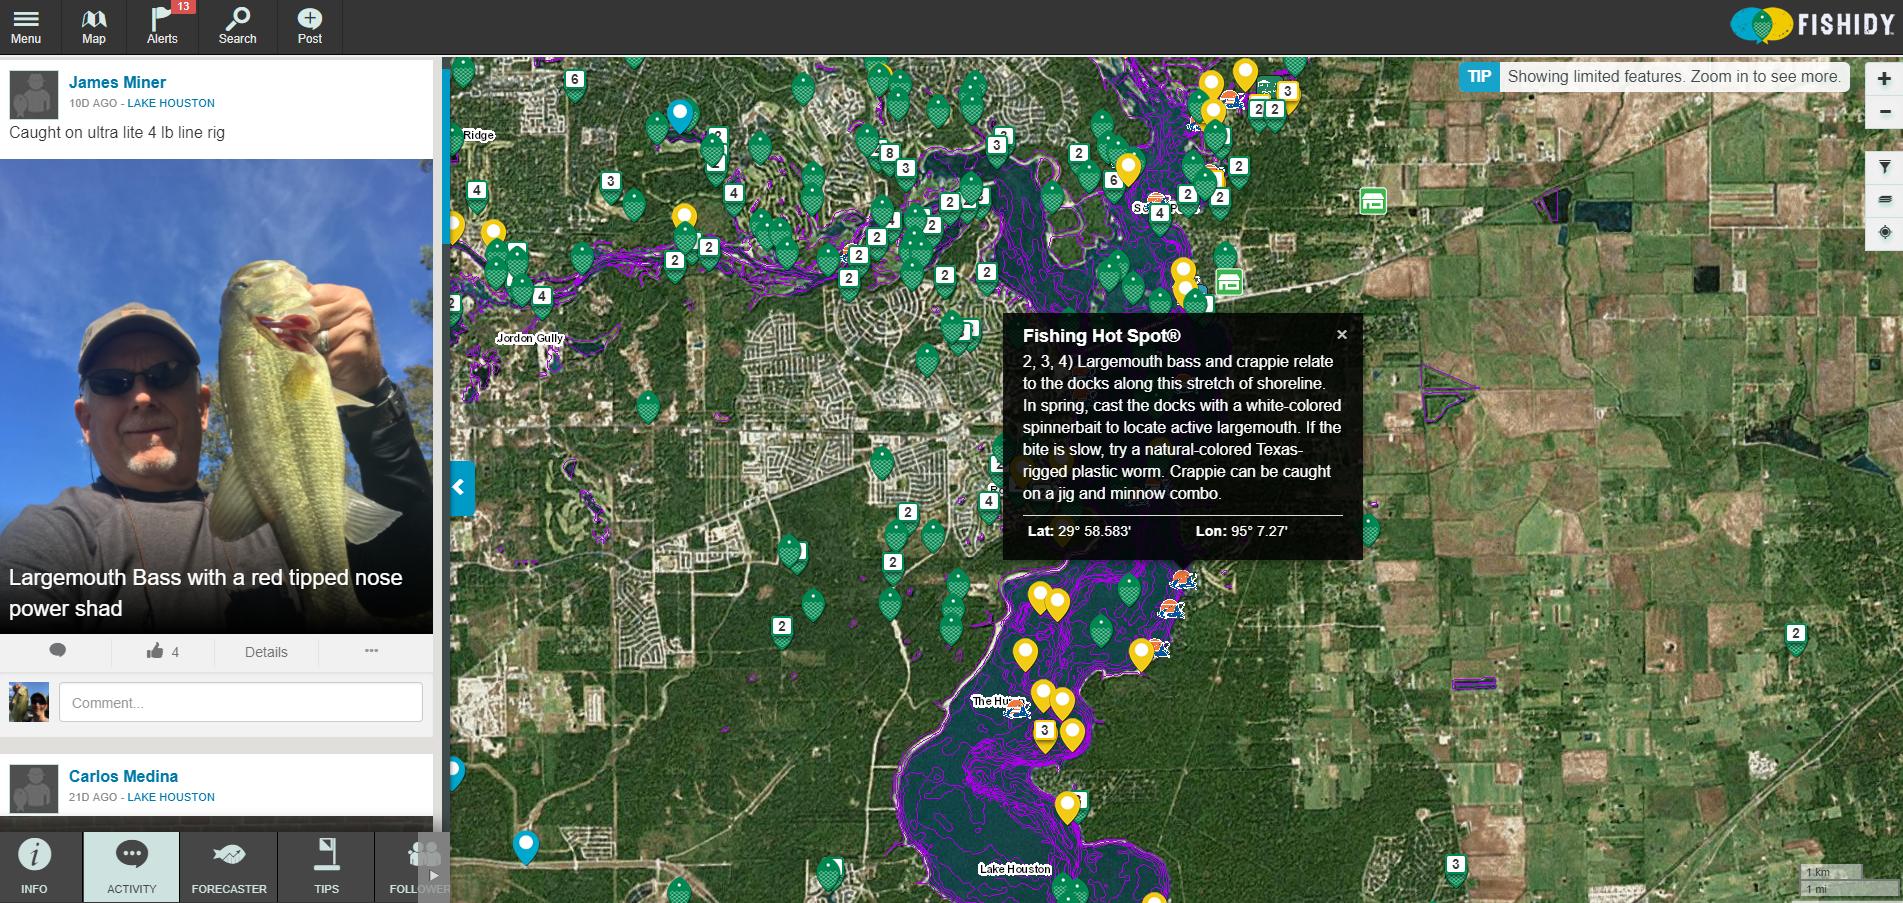 fishing hot spots lake maps Head Straight To The Fishing Hot Spots On Lake Houston With Help fishing hot spots lake maps